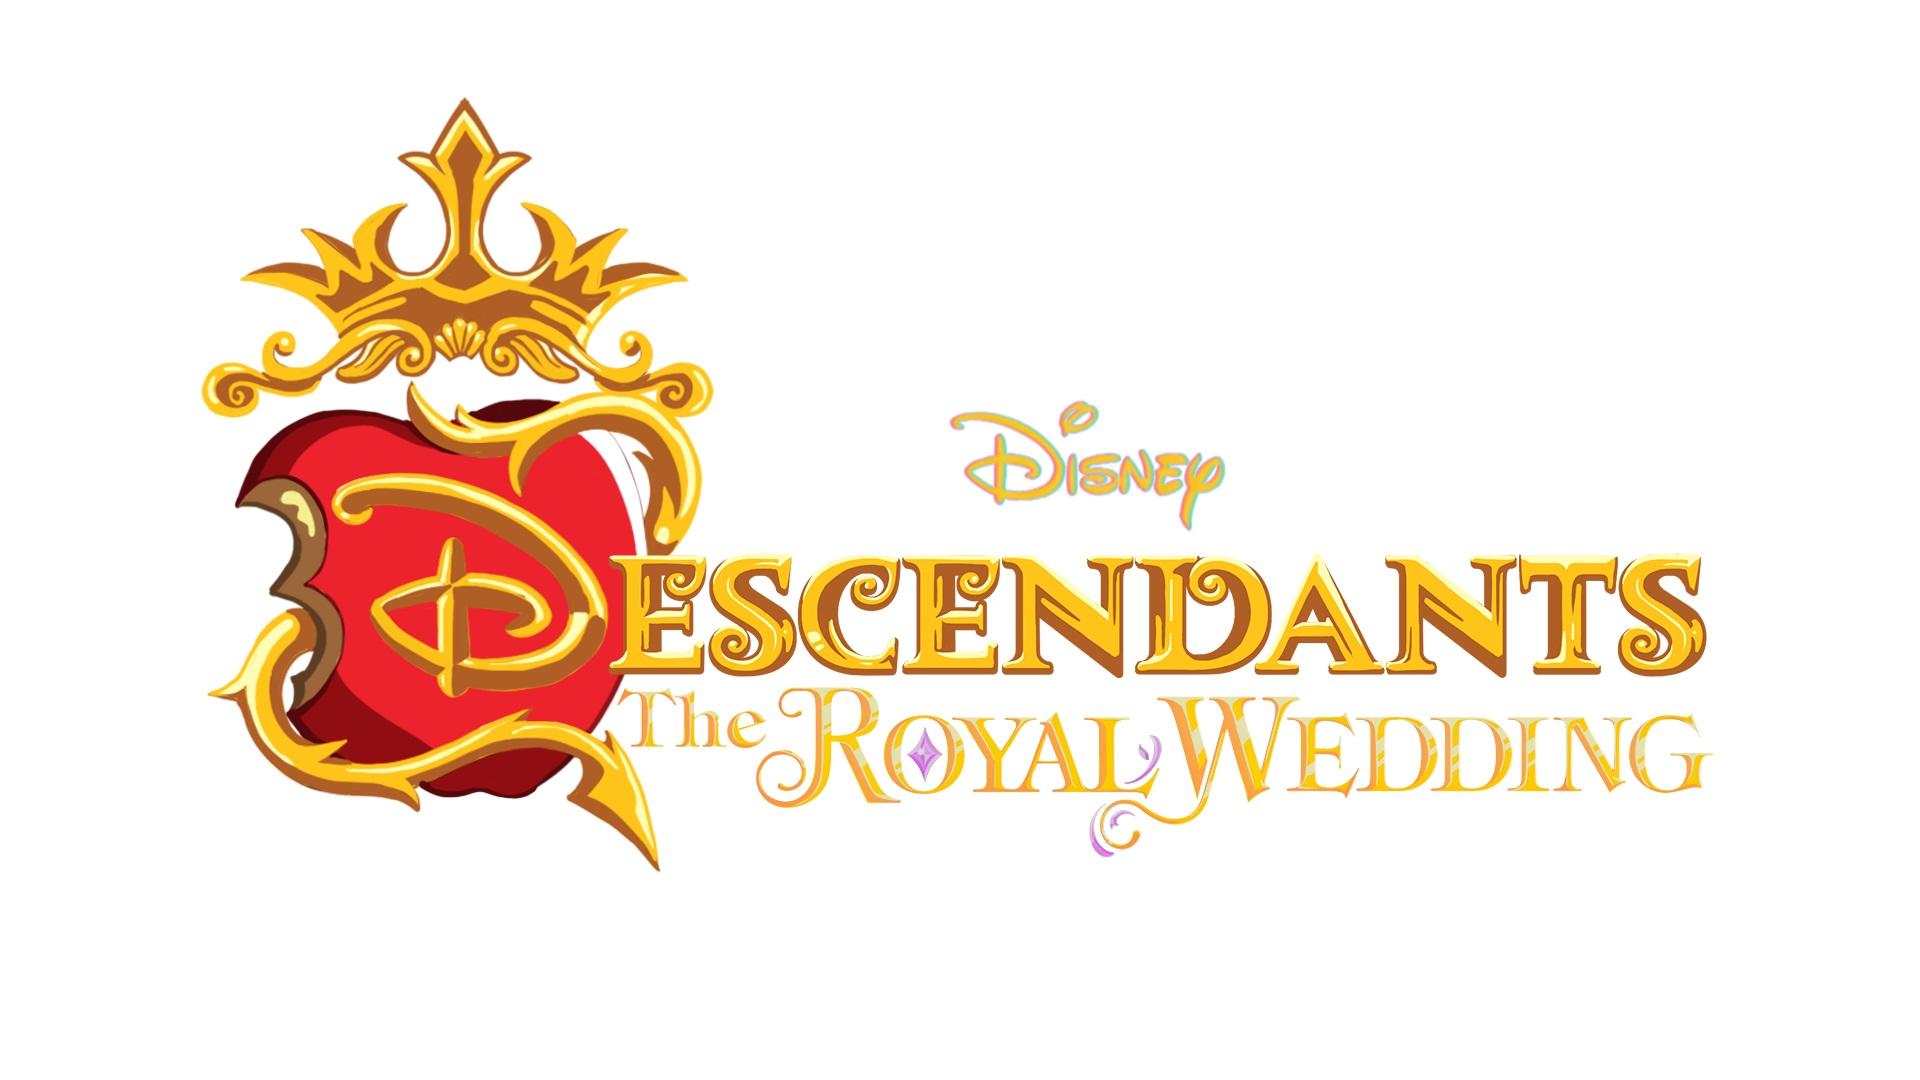 DESCENDANTS-ROYAL-WEDDING-Logo.jpg